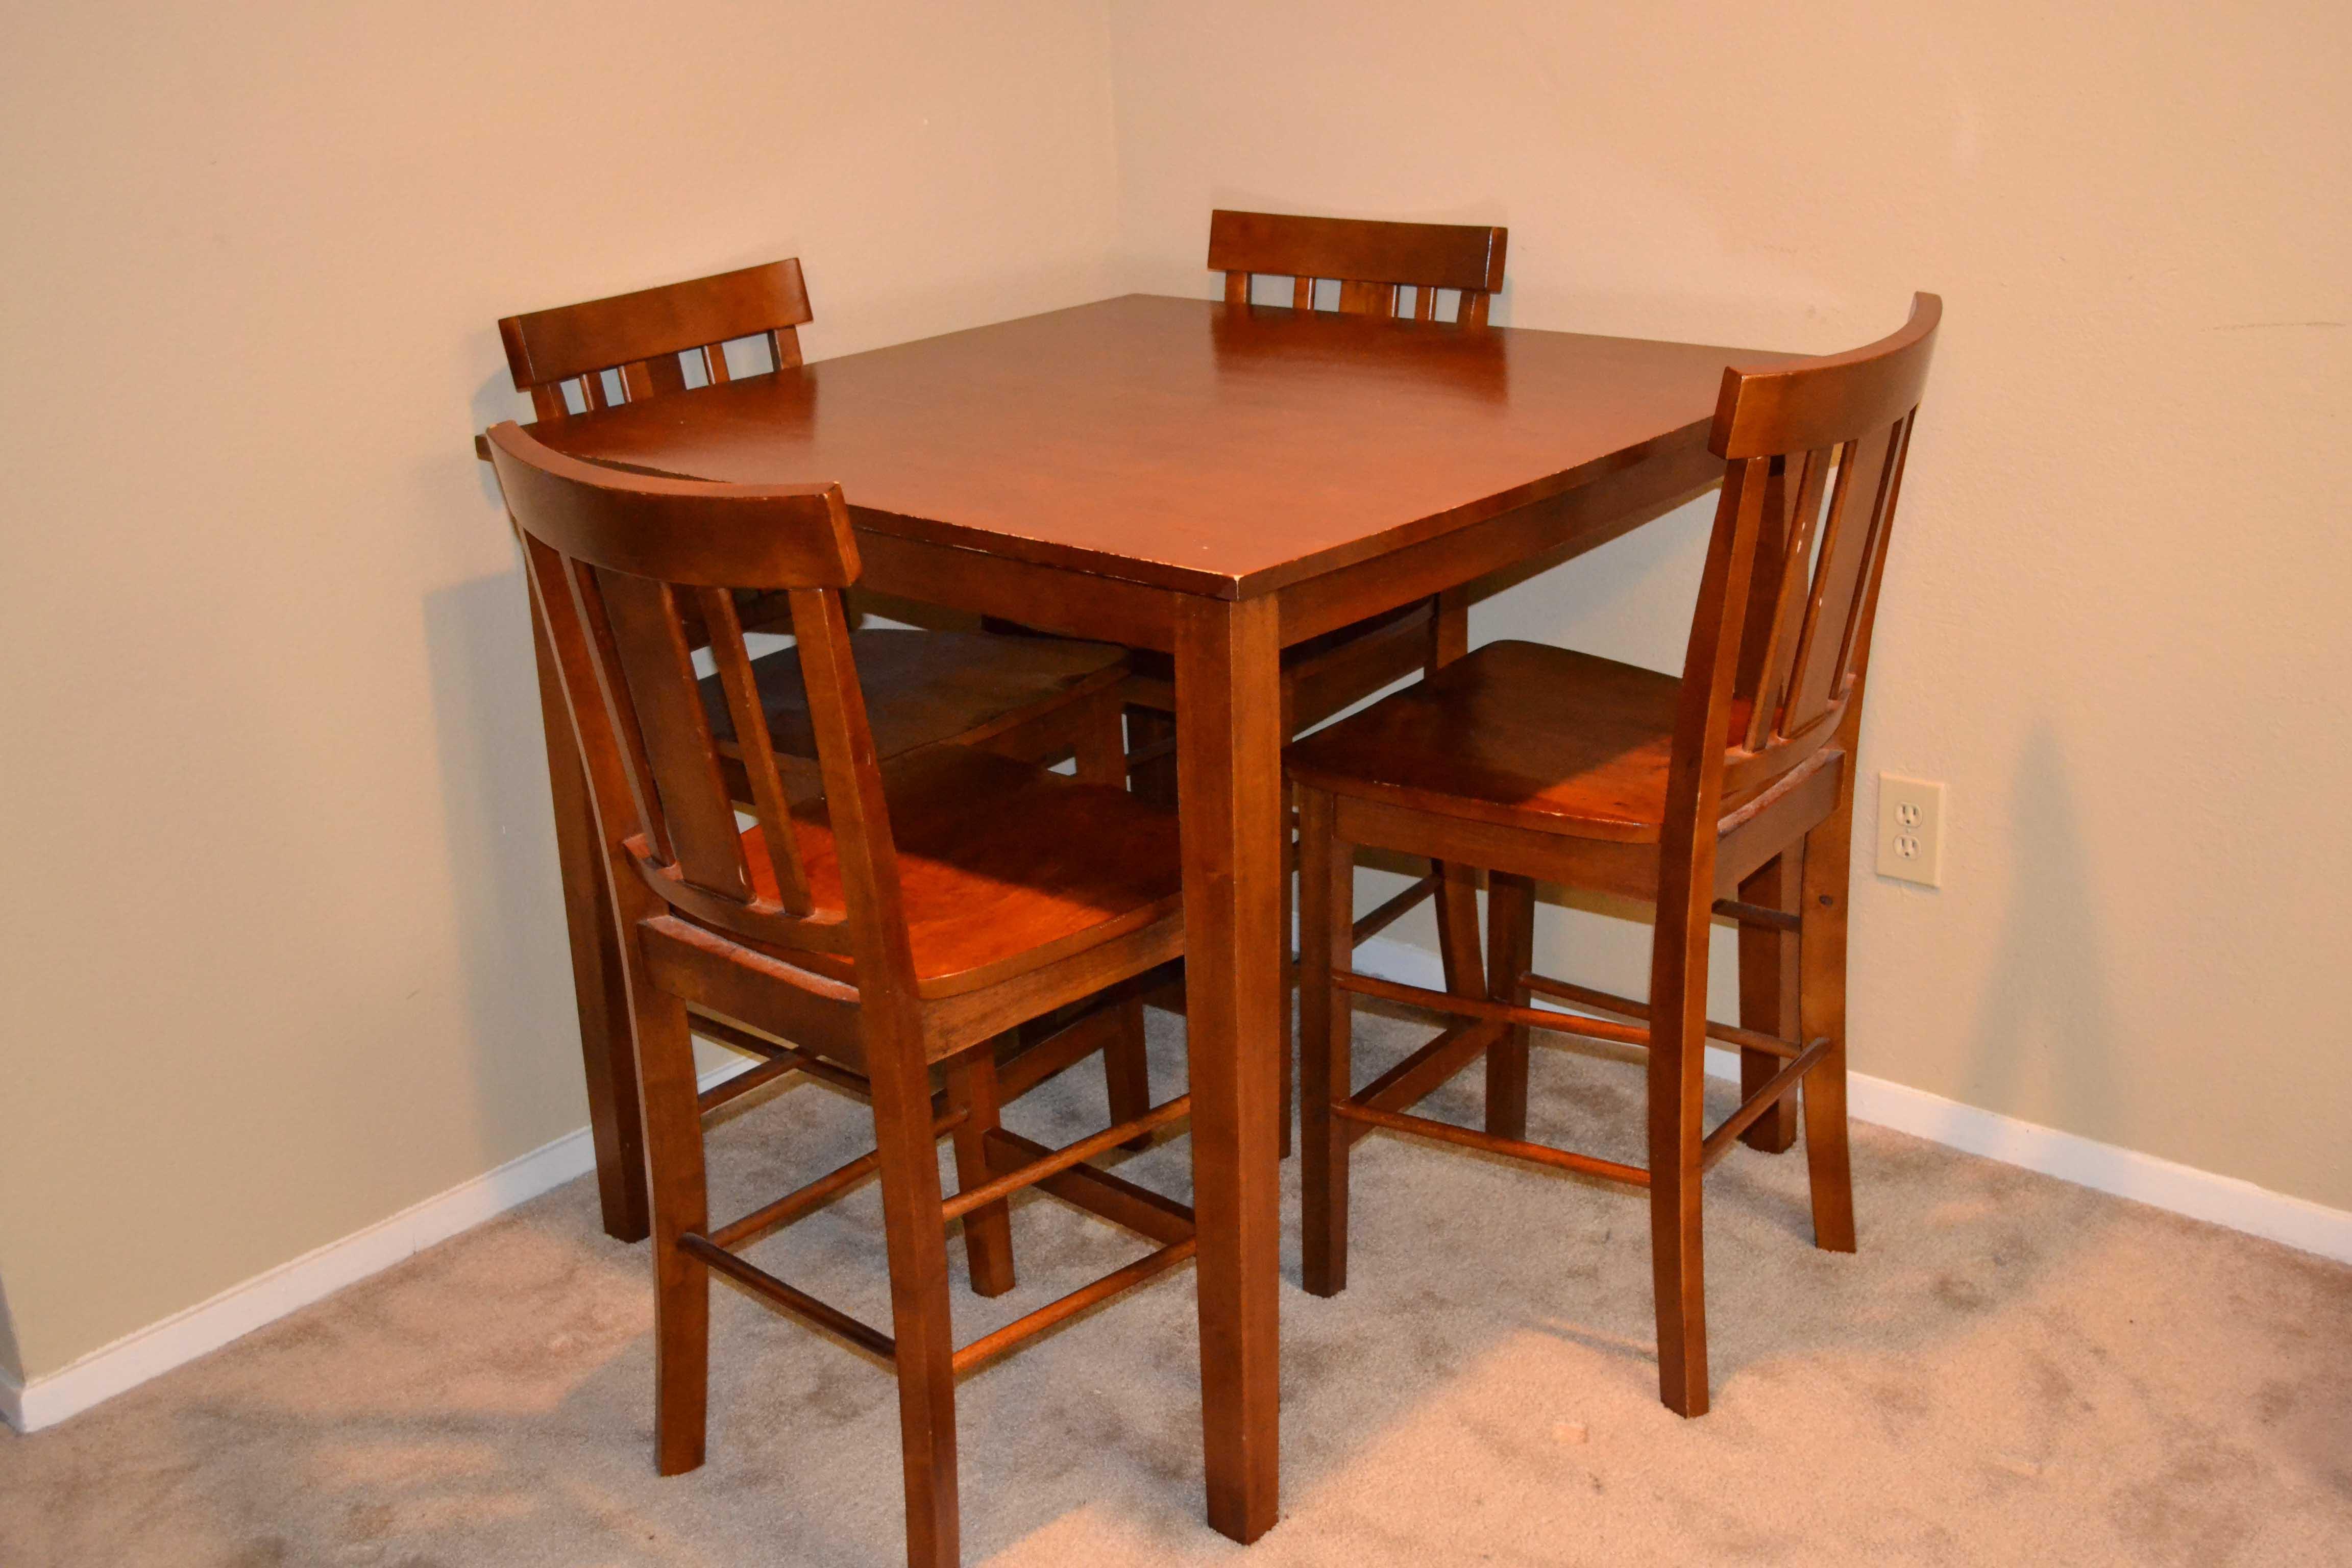 Craigslist And The Deceit Of Ikea, Craigslist Dining Room Table